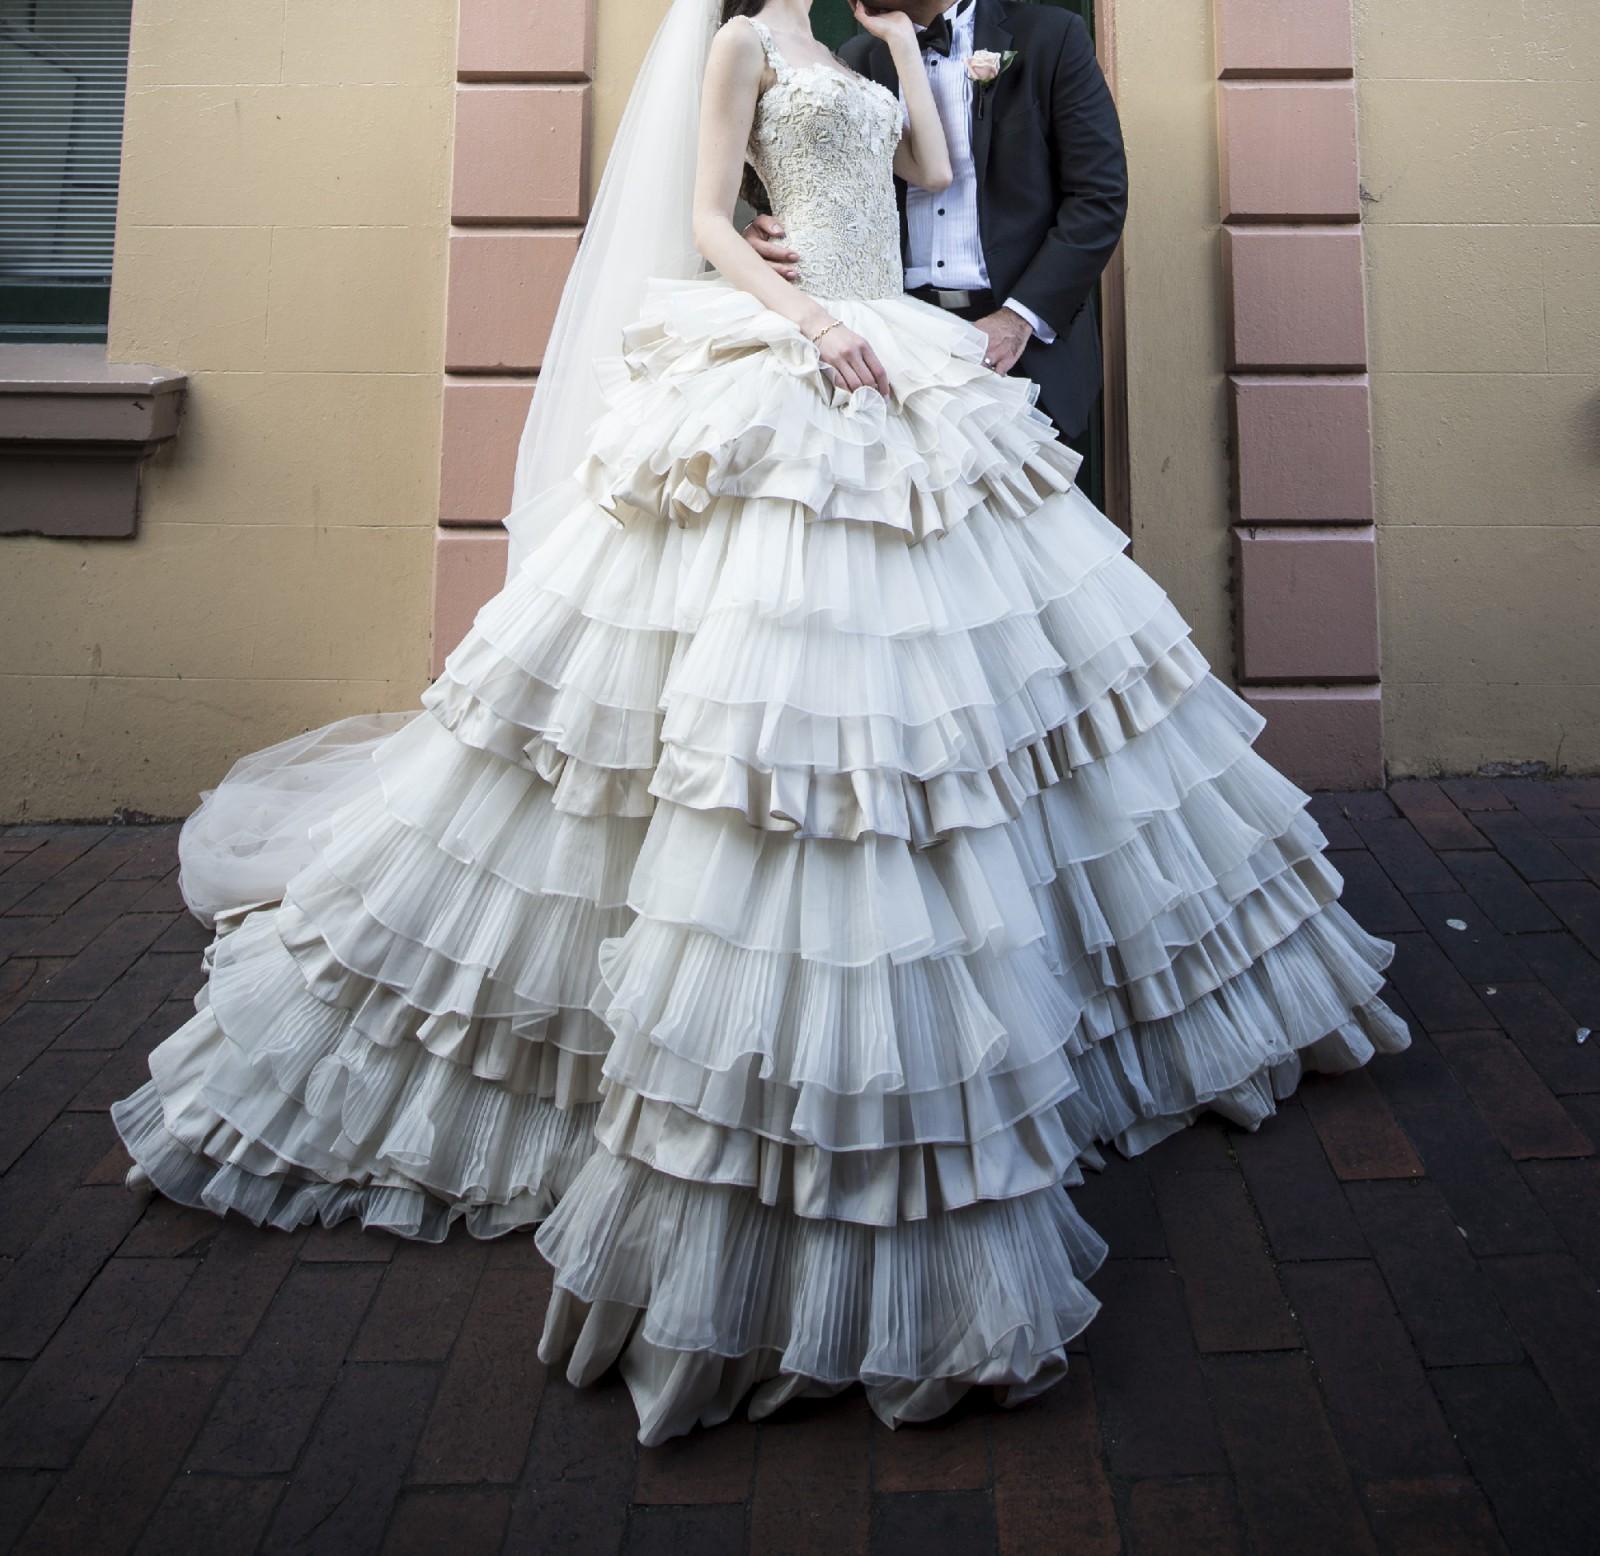 Suzanna blazevic preowned wedding dress on sale 81 off for Suzanna blazevic wedding dresses